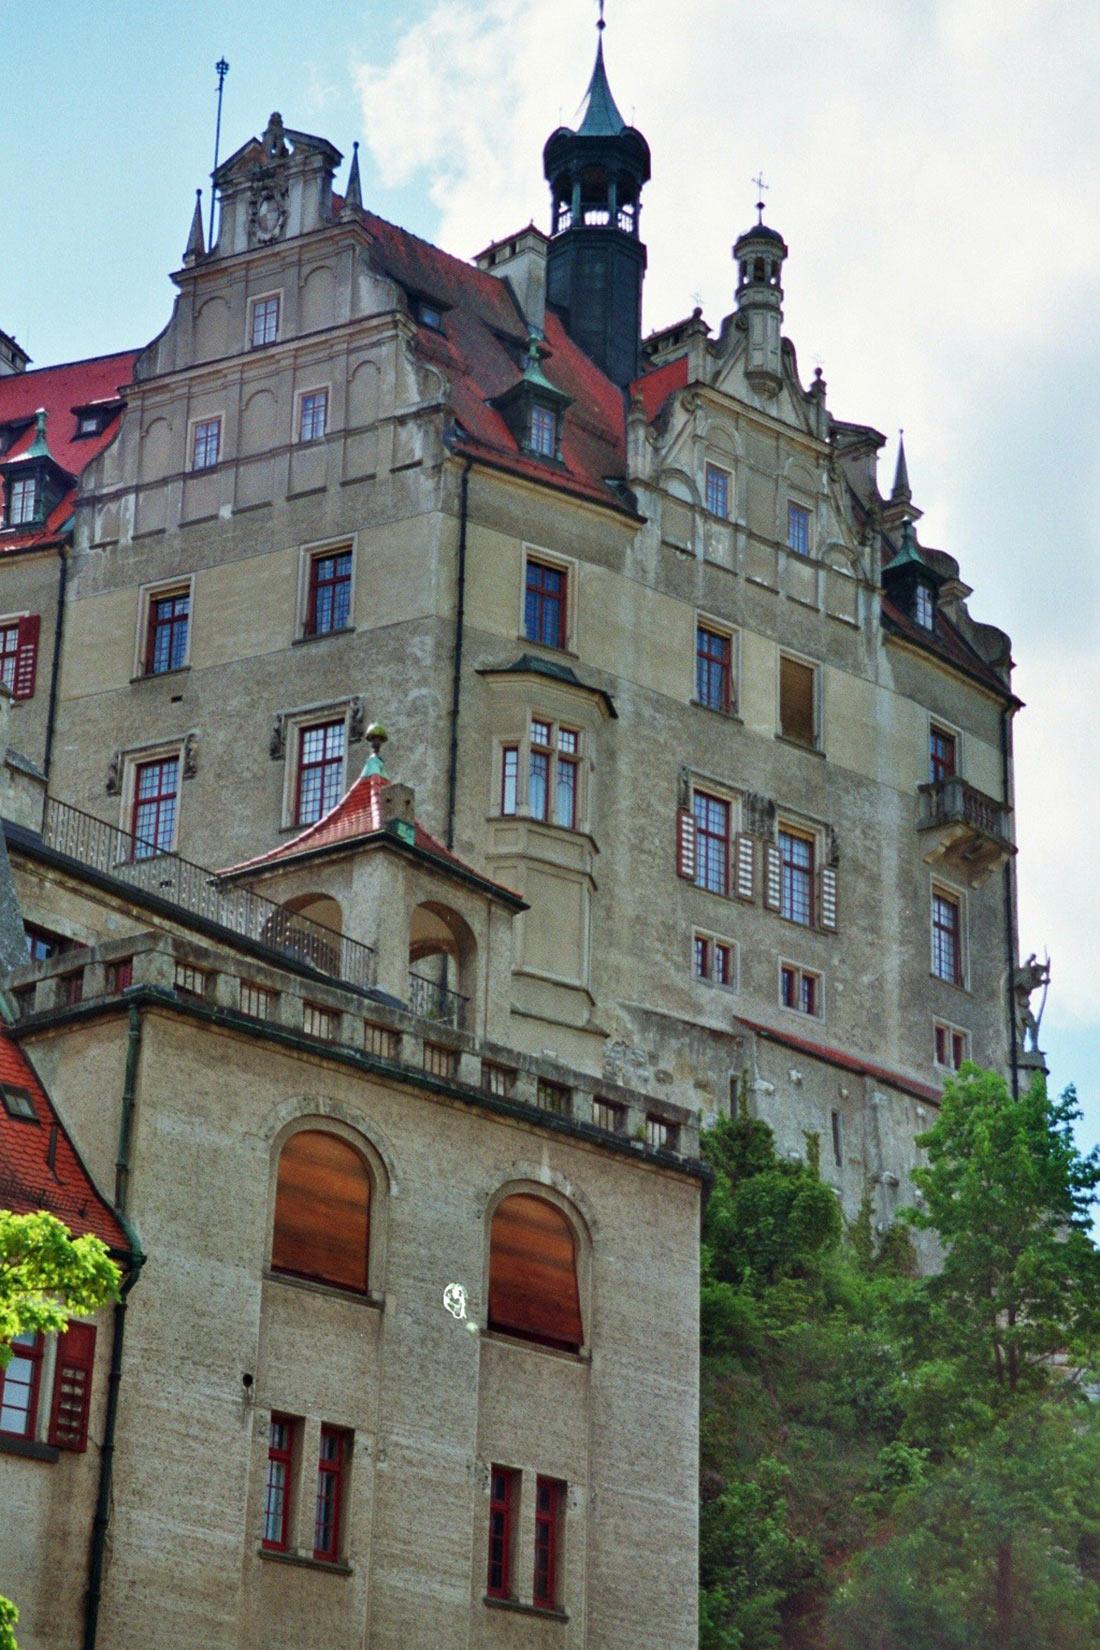 Замок Гогенцоллернов Зигмаринген